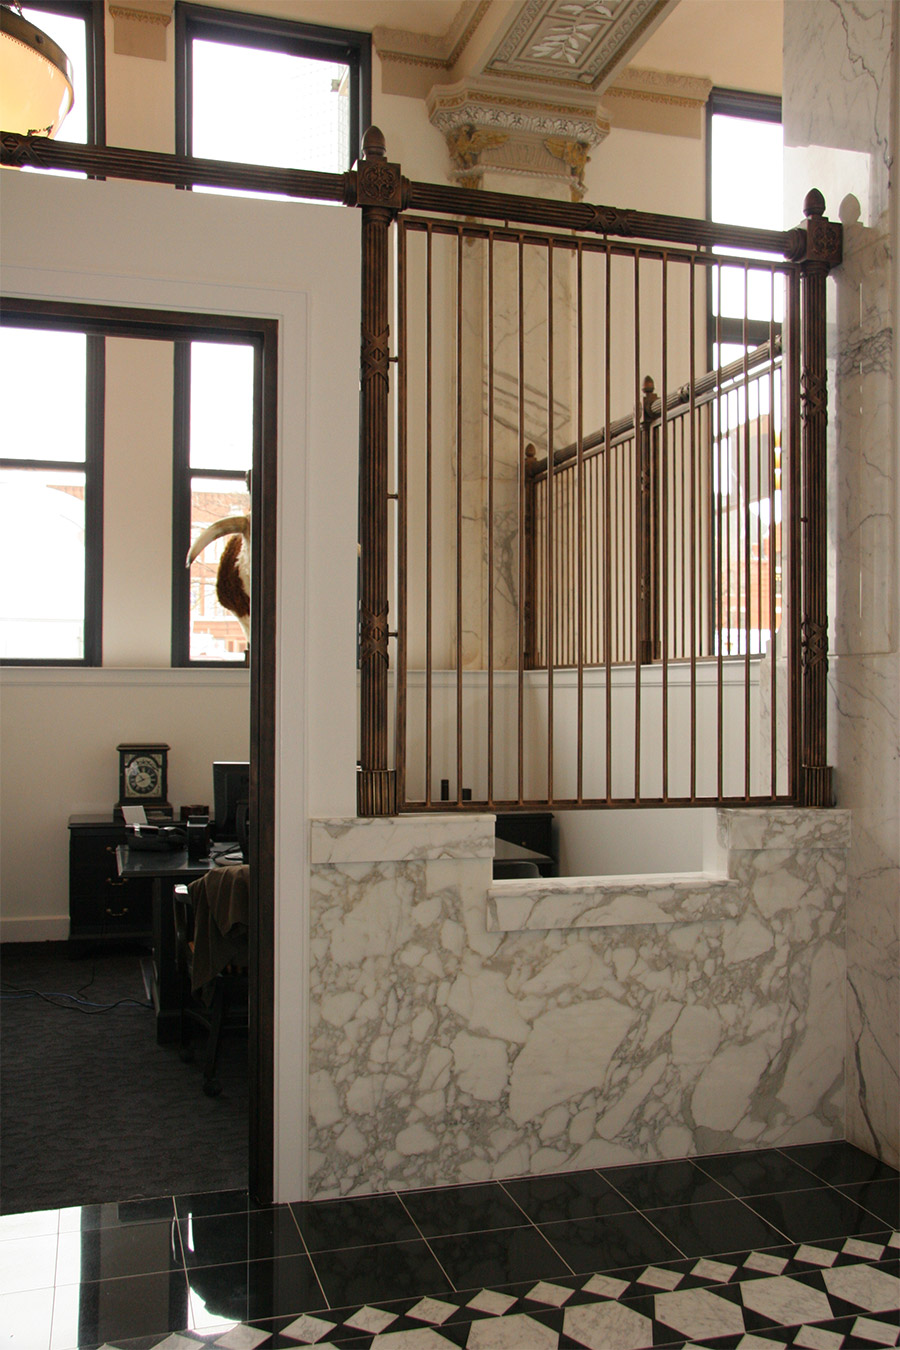 Worthington-CLA-S2-073-Classic-Steel-Doors-(35)-como-objeto-inteligente-1